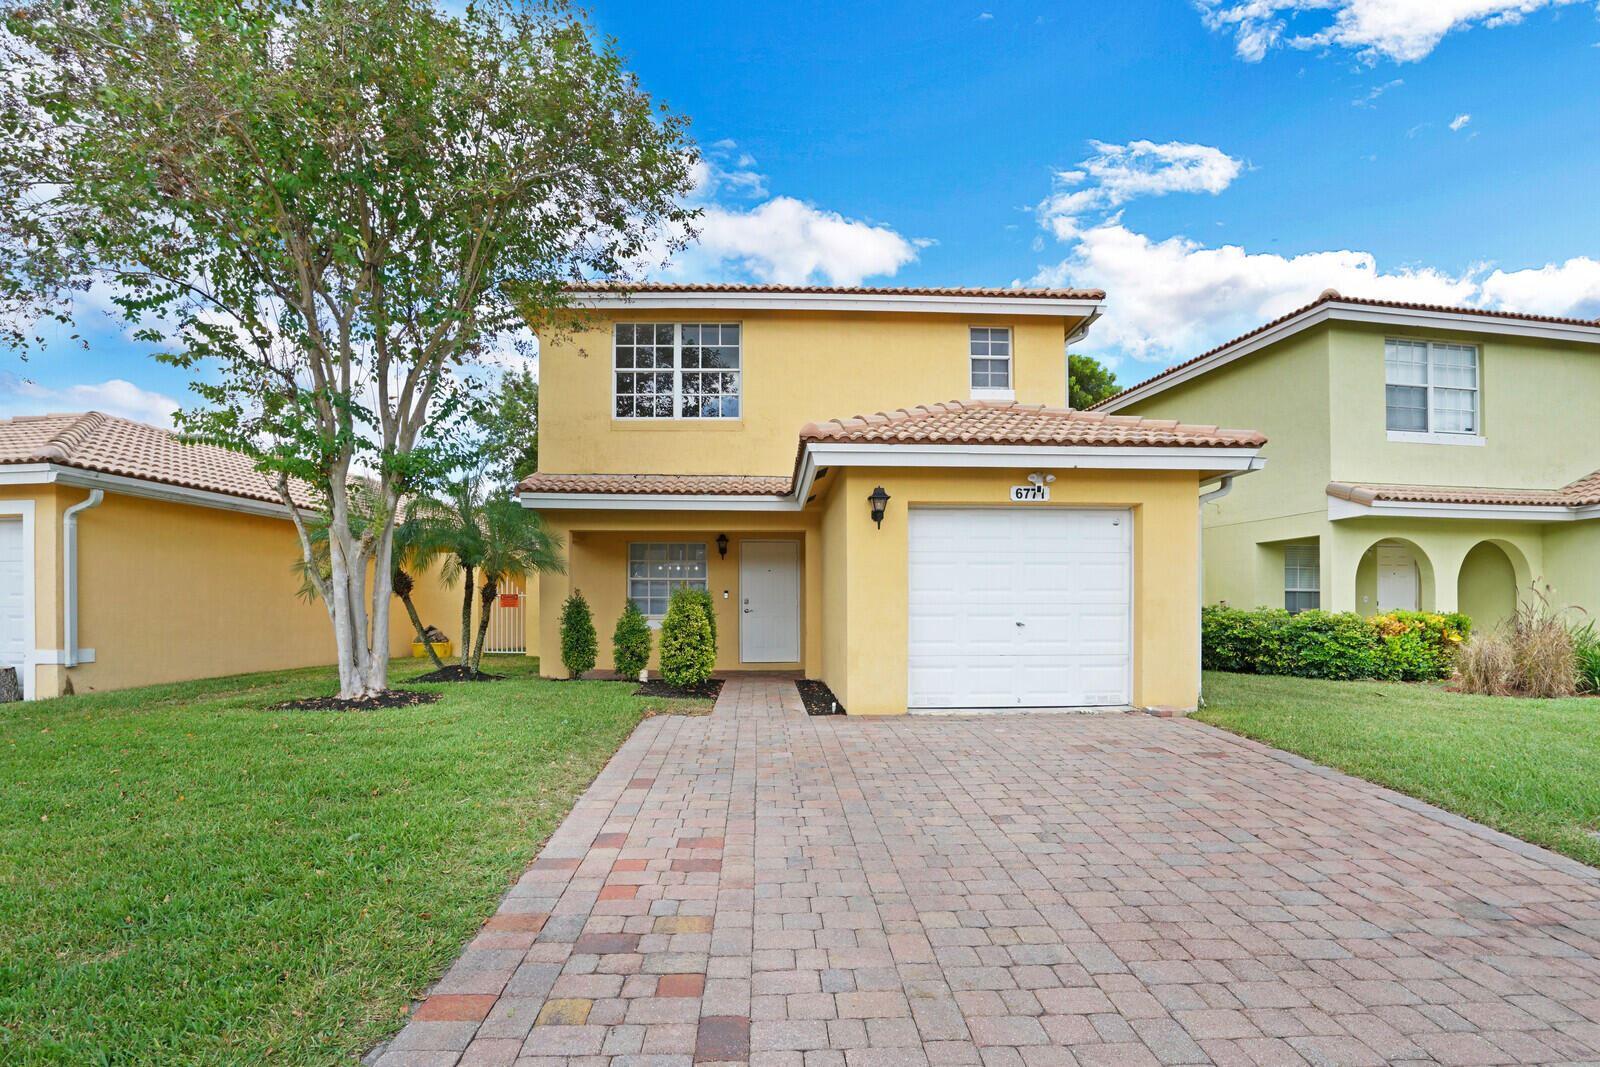 6771 Duval Avenue, West Palm Beach, FL 33411 - MLS#: RX-10753186